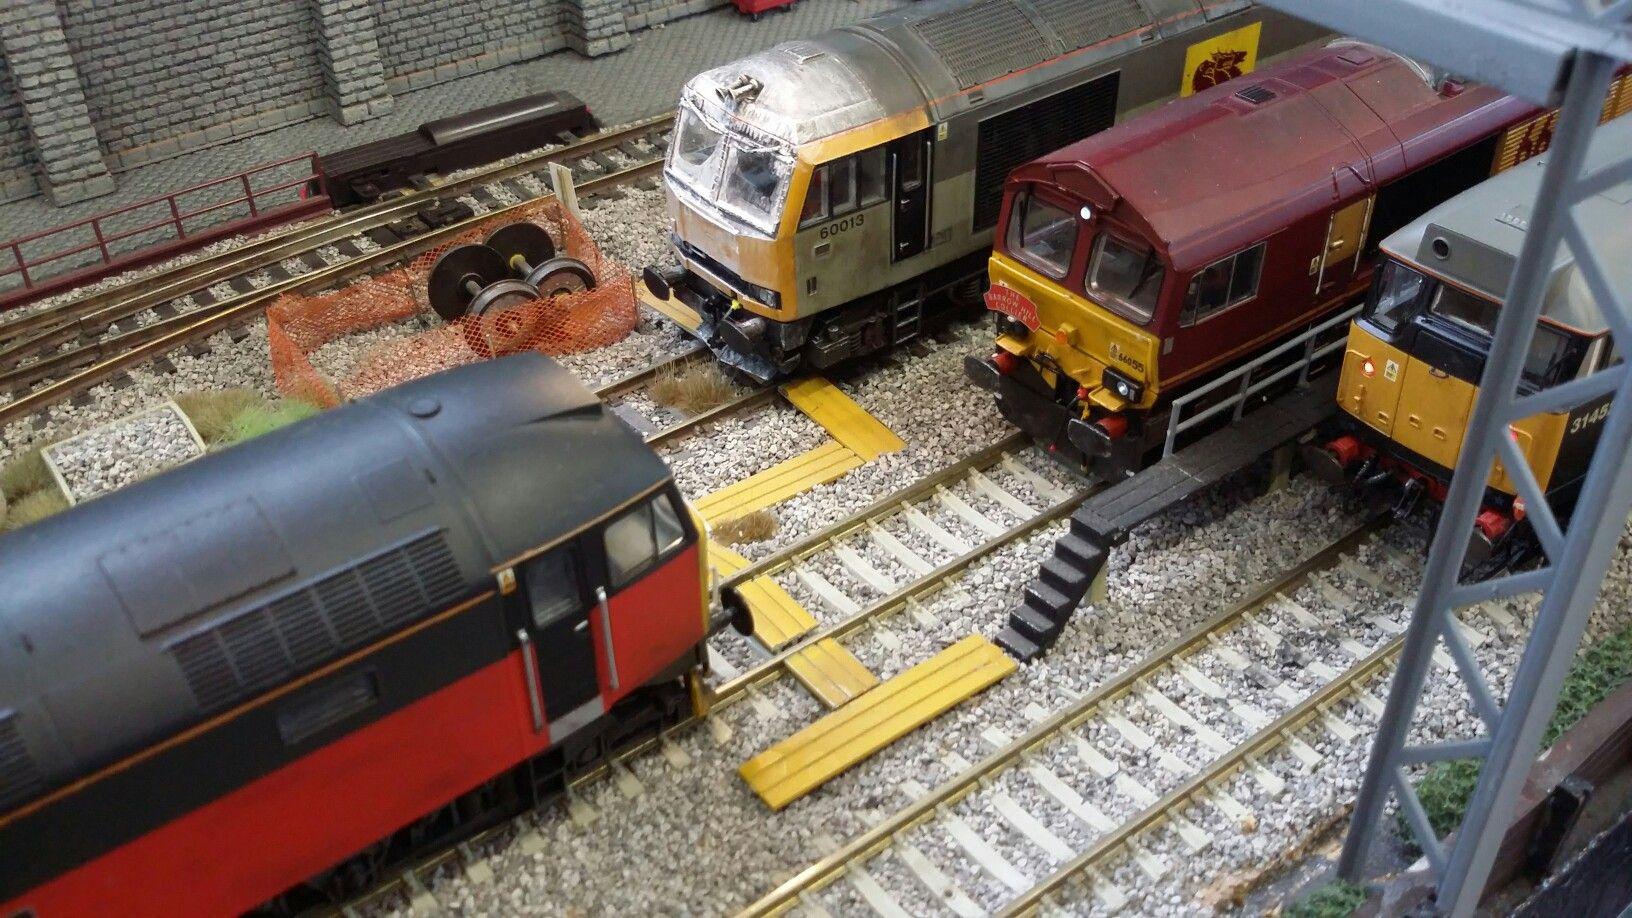 Pin by Stephanie Dearden on Rail layout ideas (track plans ...